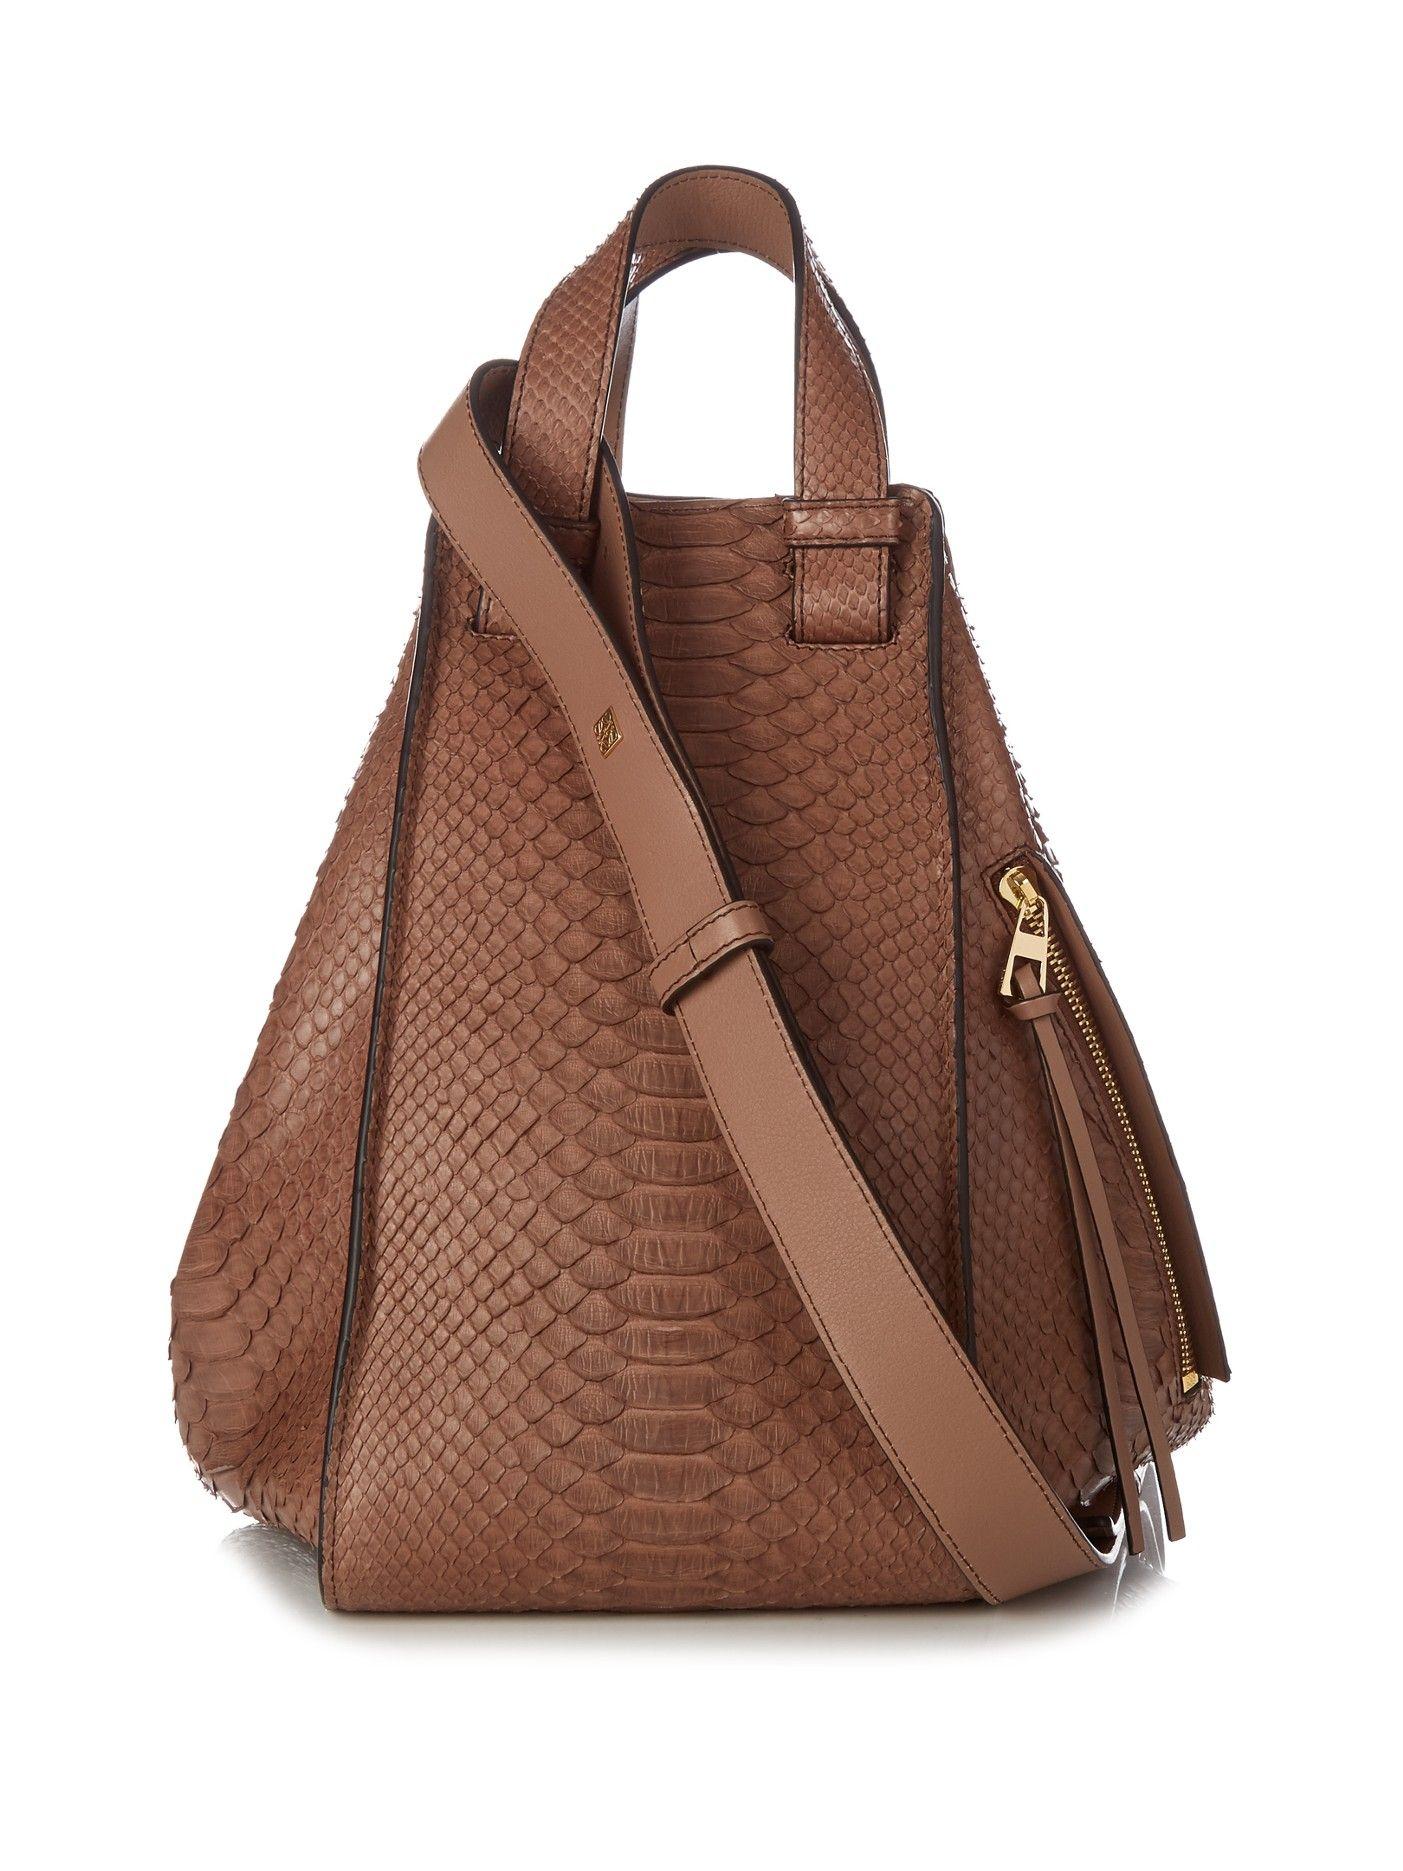 Hammock Python And Leather Bag Loewe T0o26ZFP9c